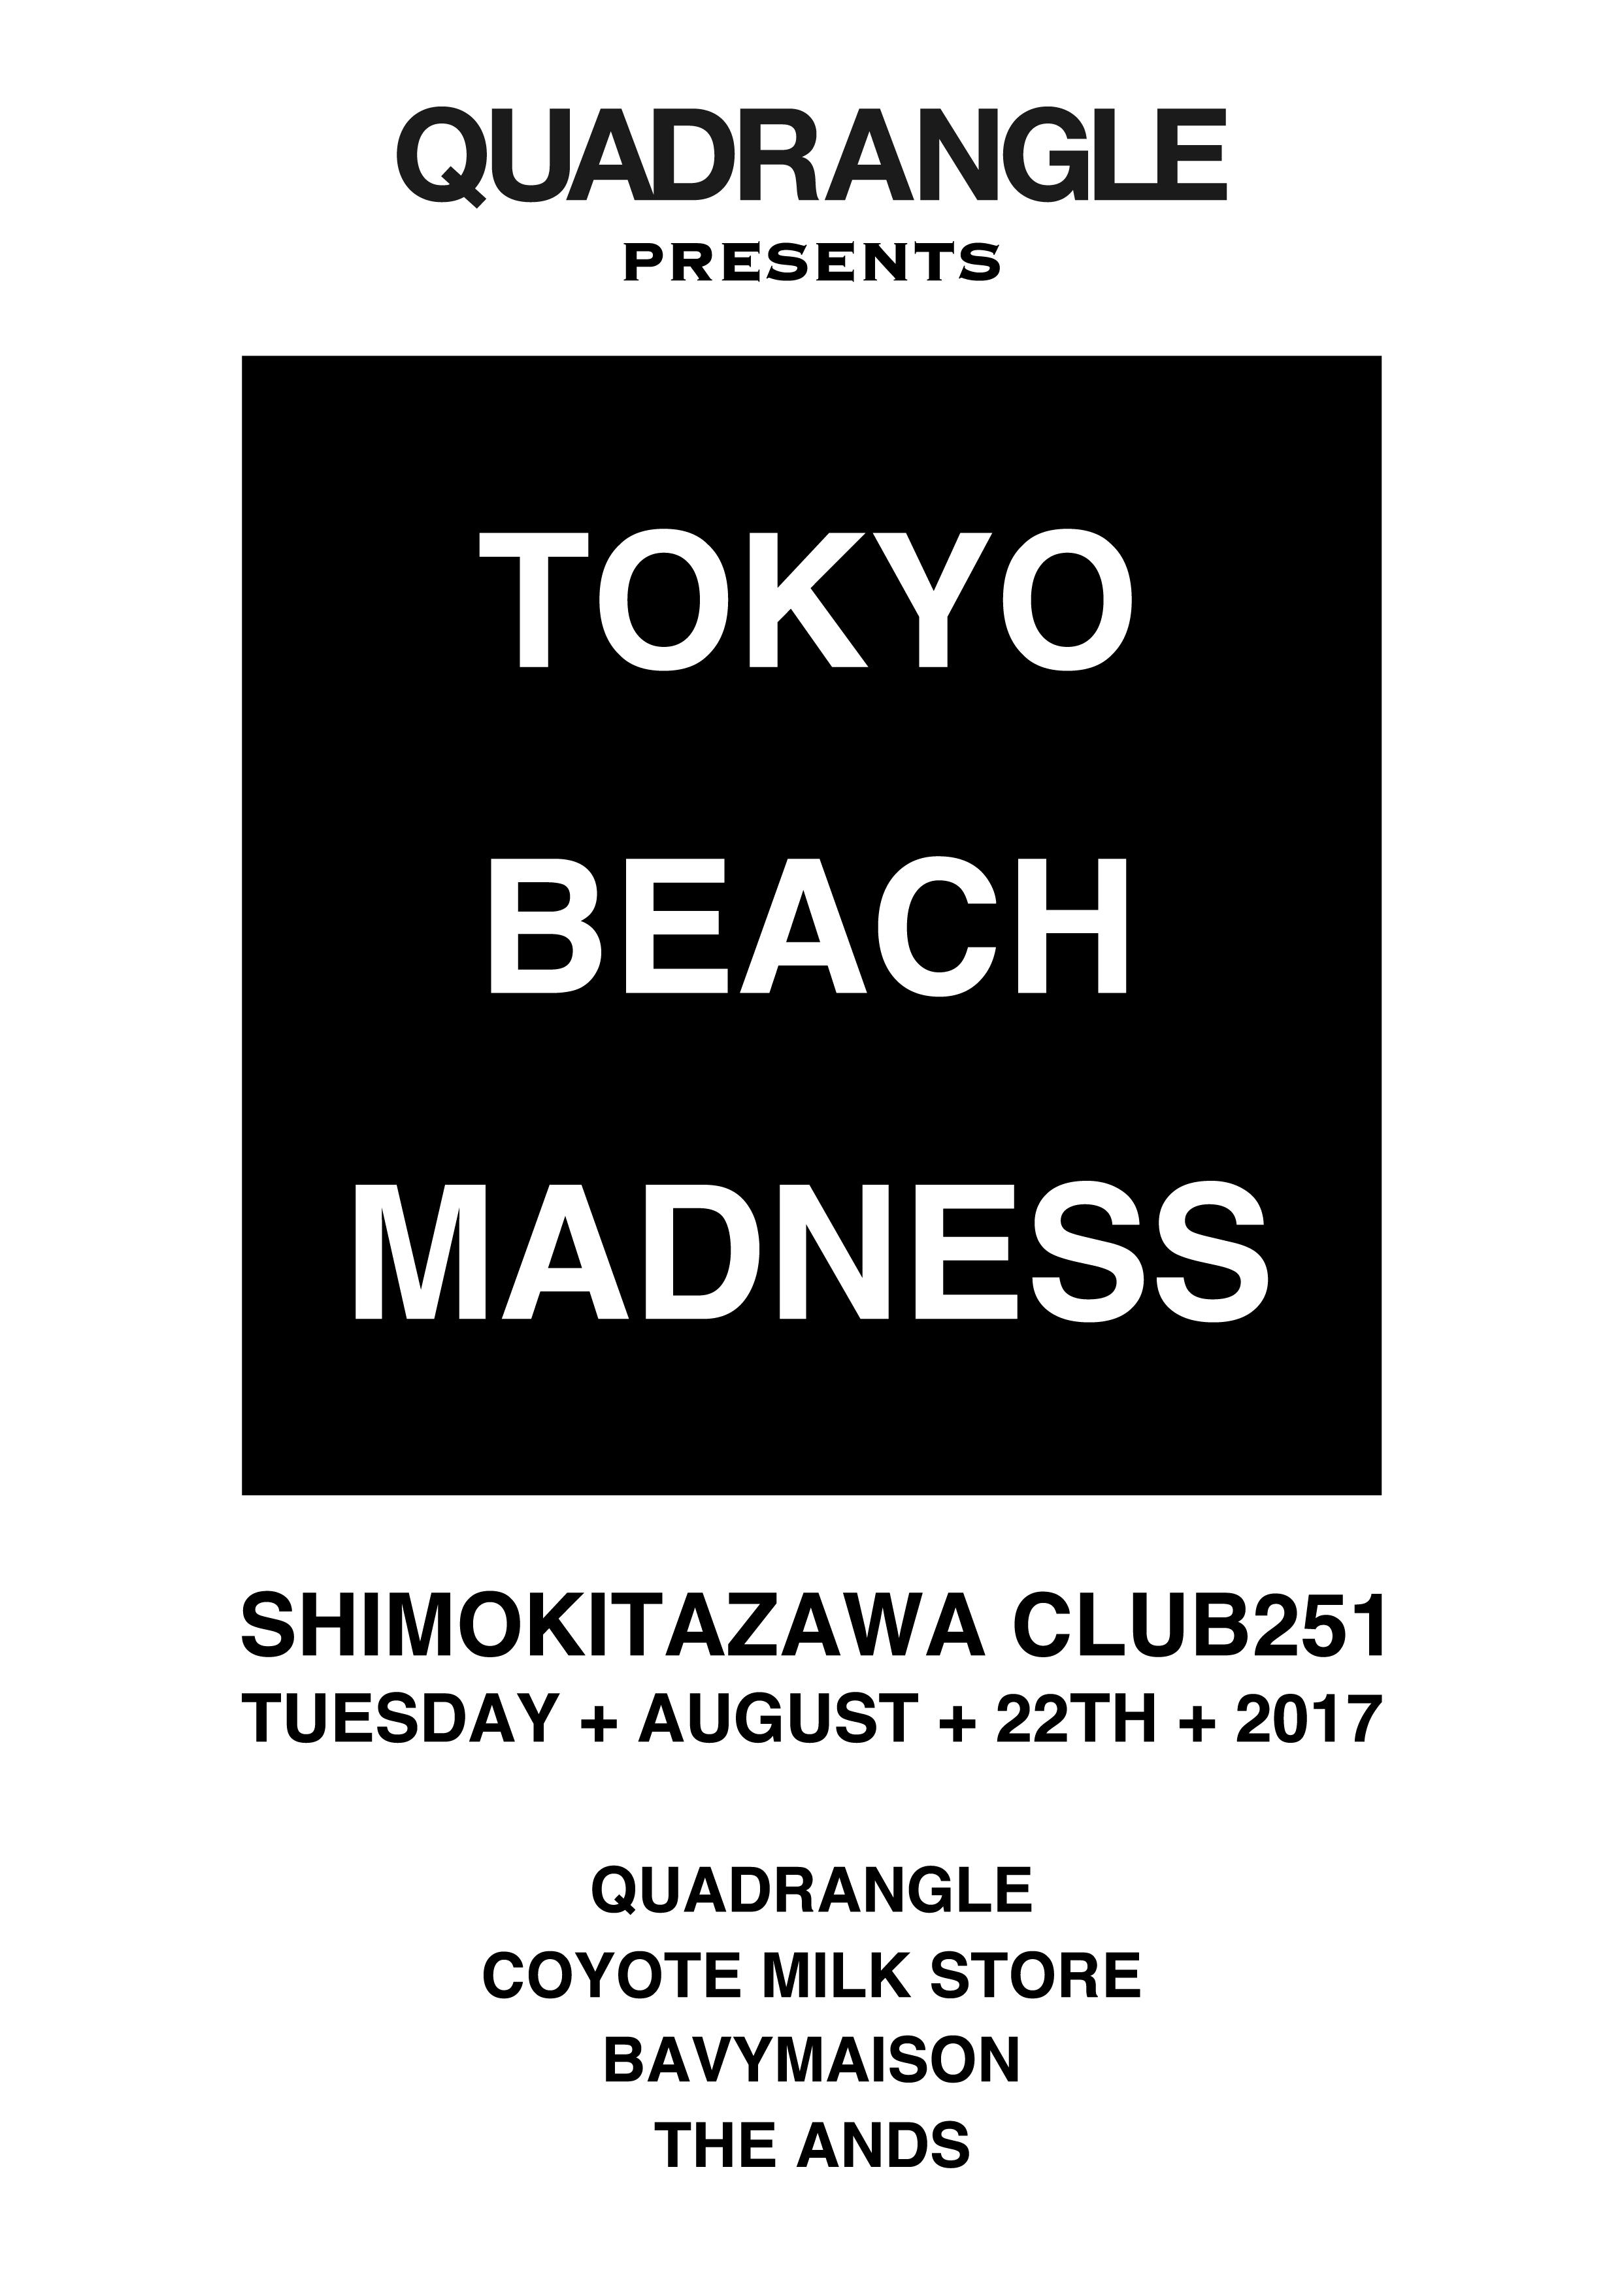 QUADRANGLE PRESENTS TOKYO BEACH MADNESS